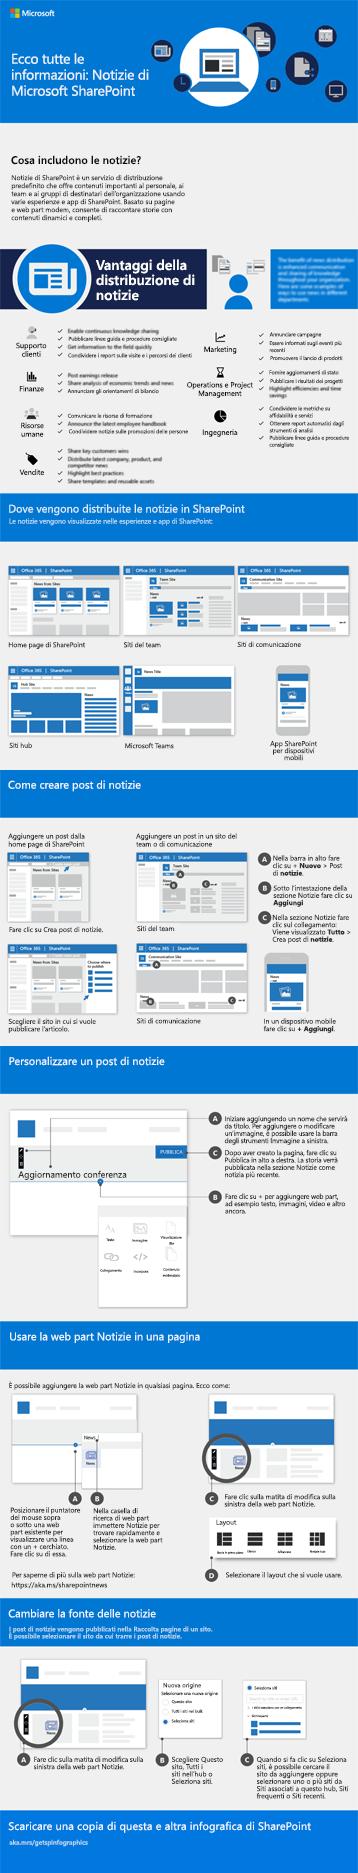 Infografica sulle novità di SharePoint